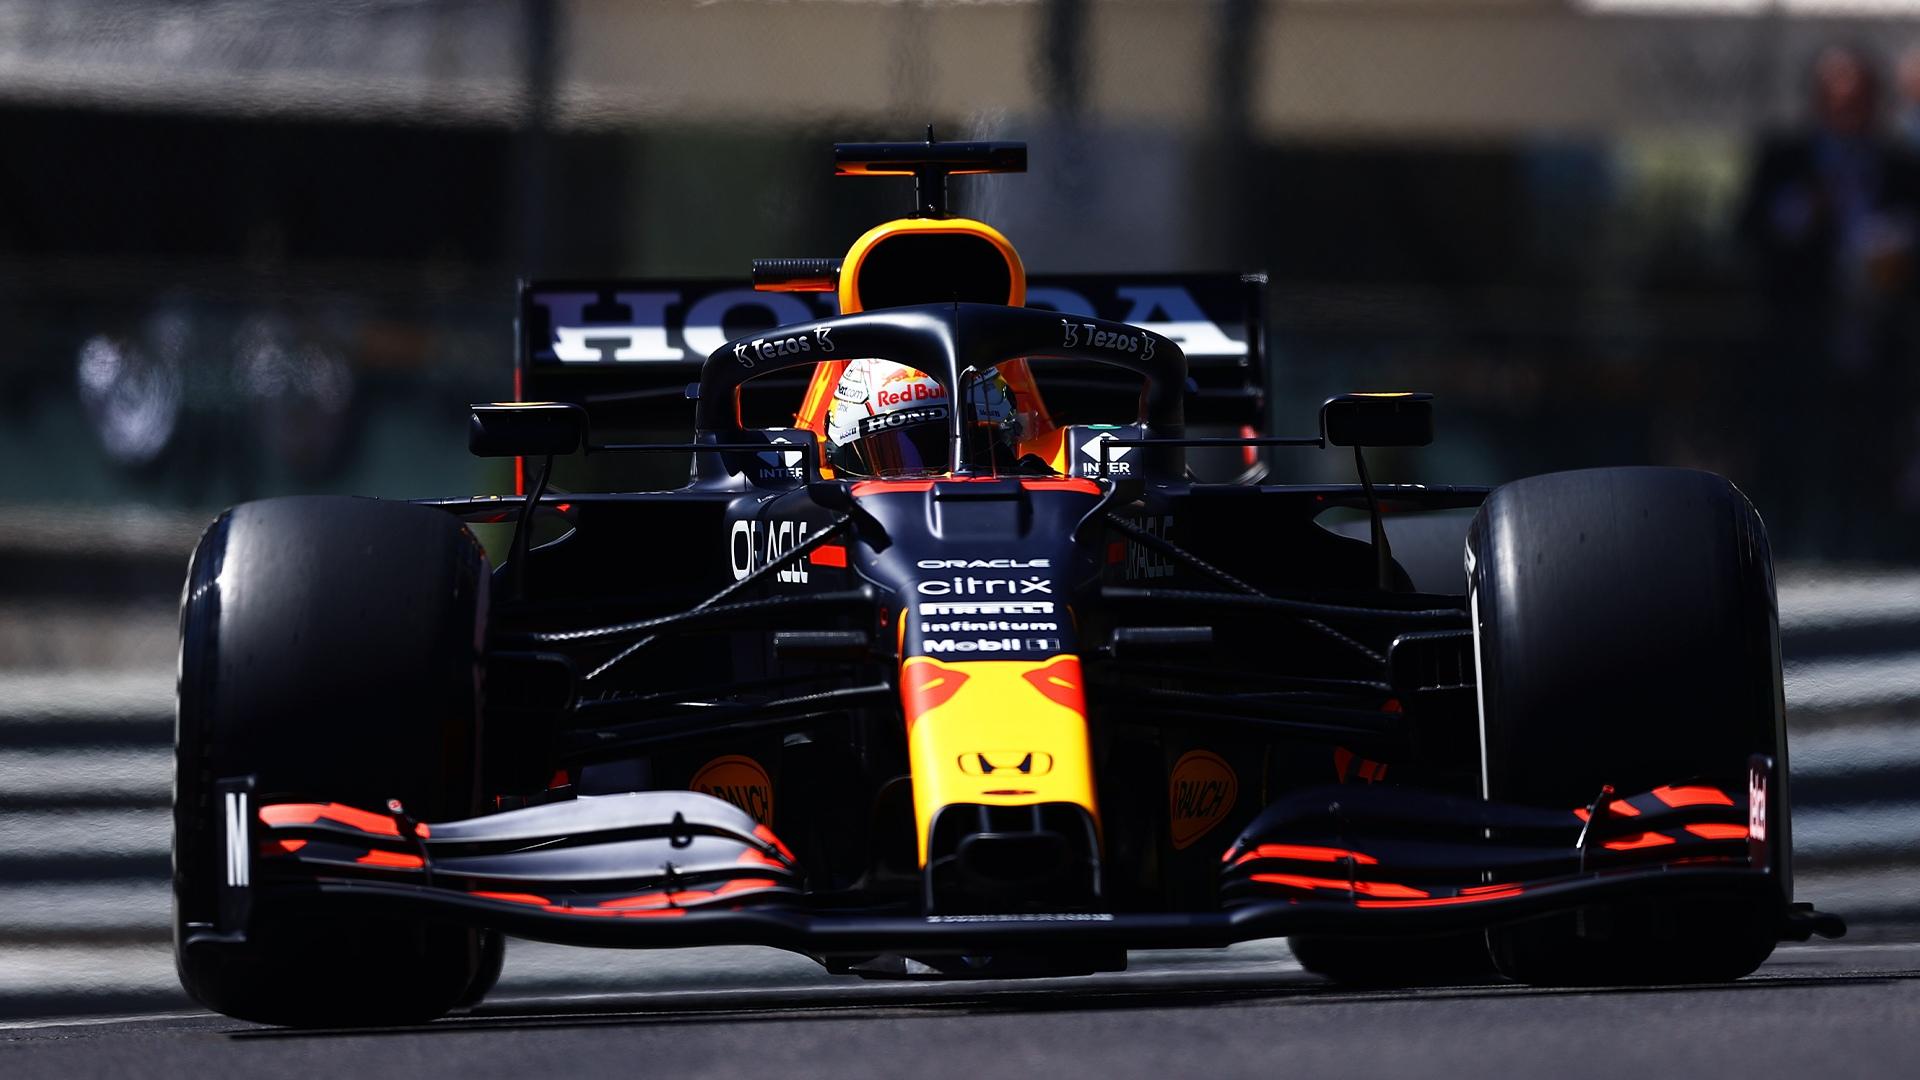 Макс Ферстаппен лидирует в личном зачёте Ф1 после гран-при Монако 2021 года